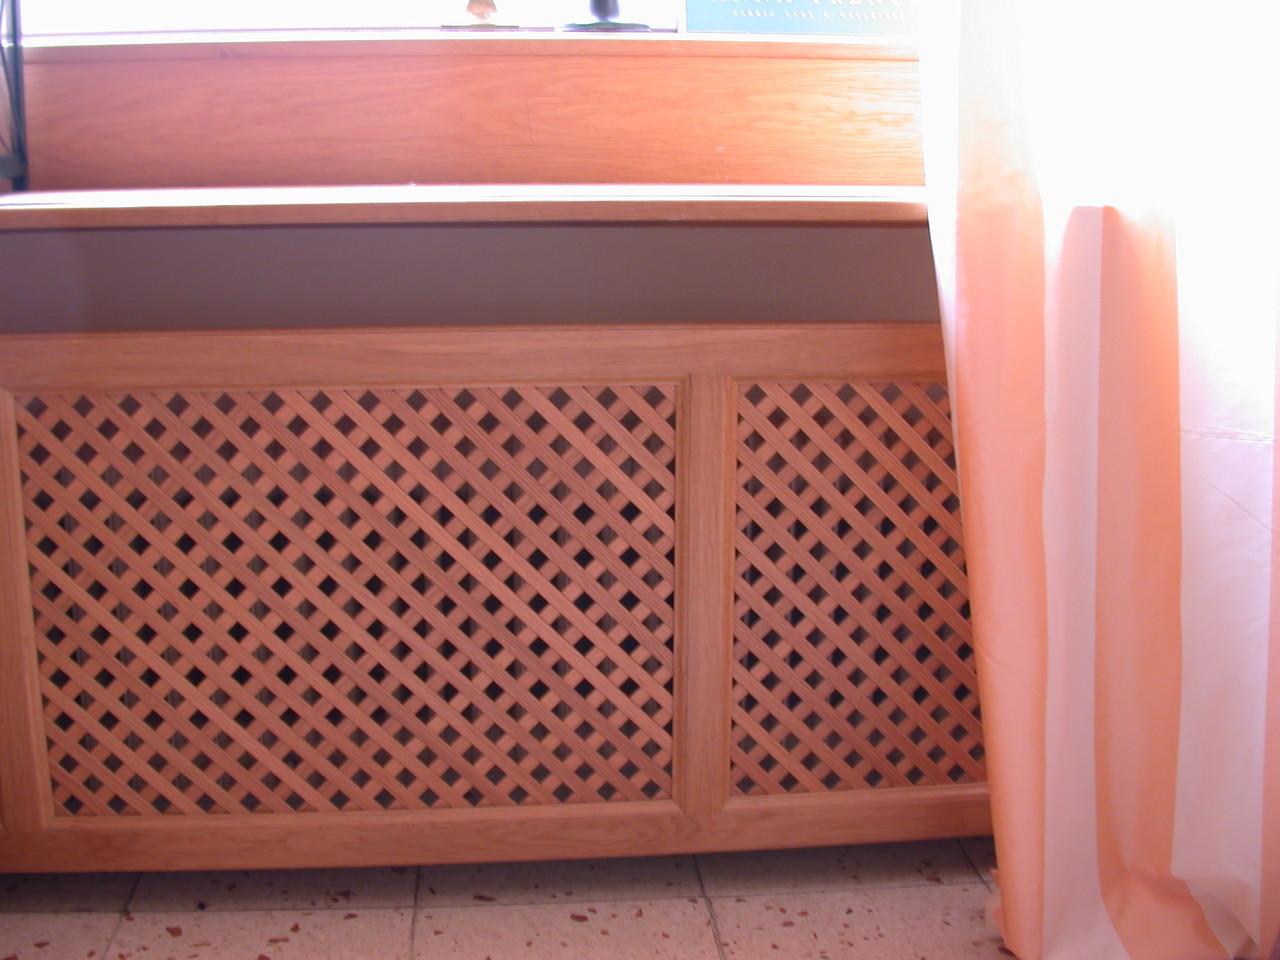 Heizkörperverkleidung 4 mit Holzgitter Venedig Raster 16-16 Eiche